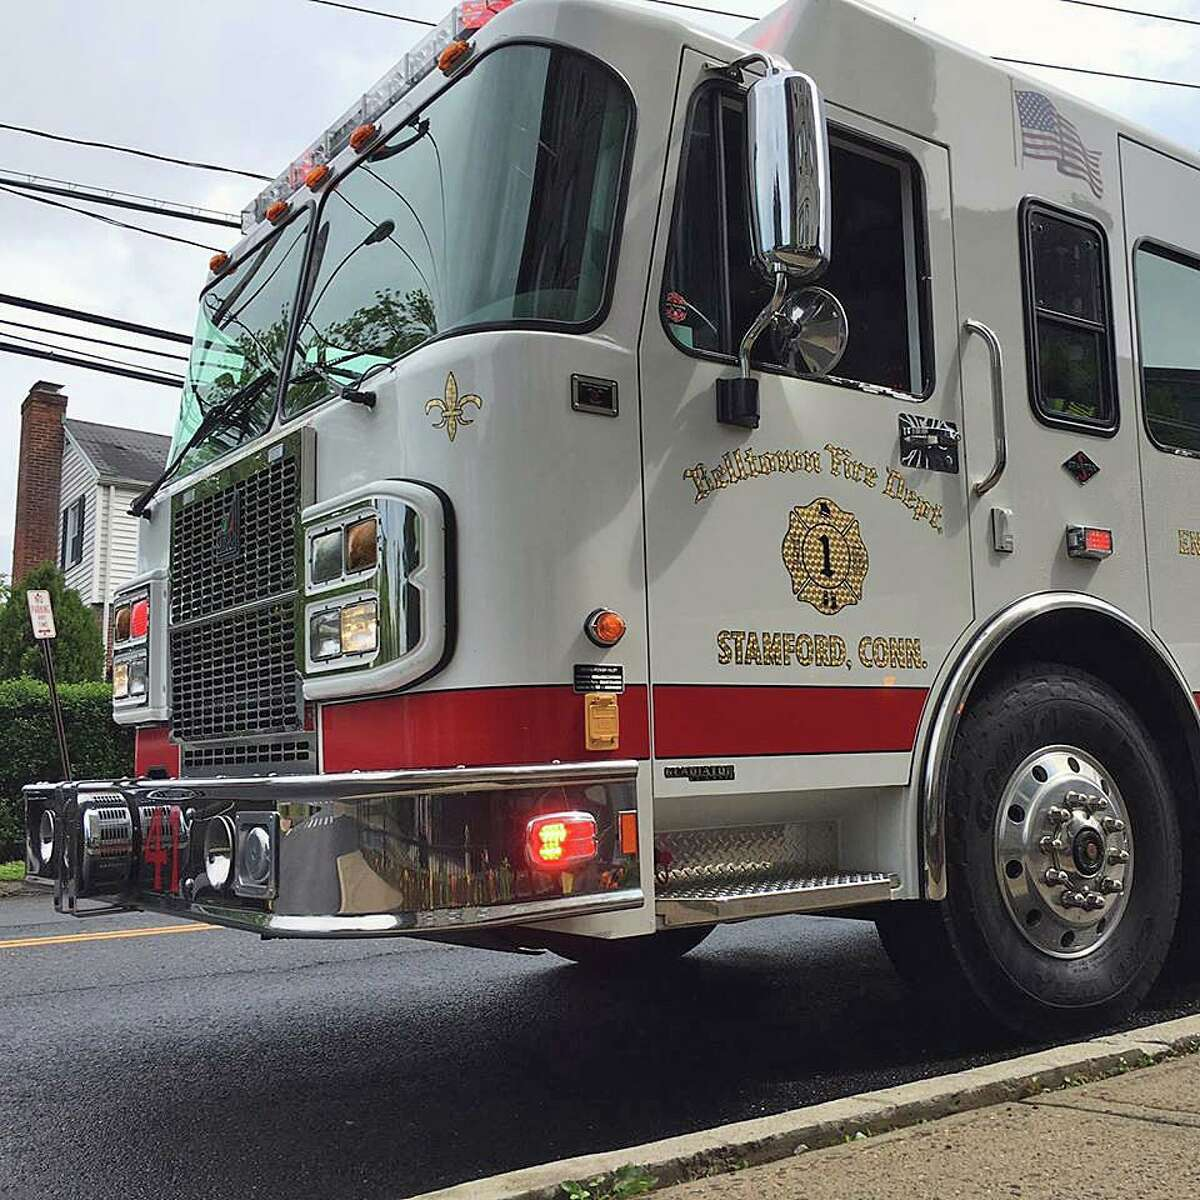 A file photo of a Belltown Volunteer Fire Department fire engine.